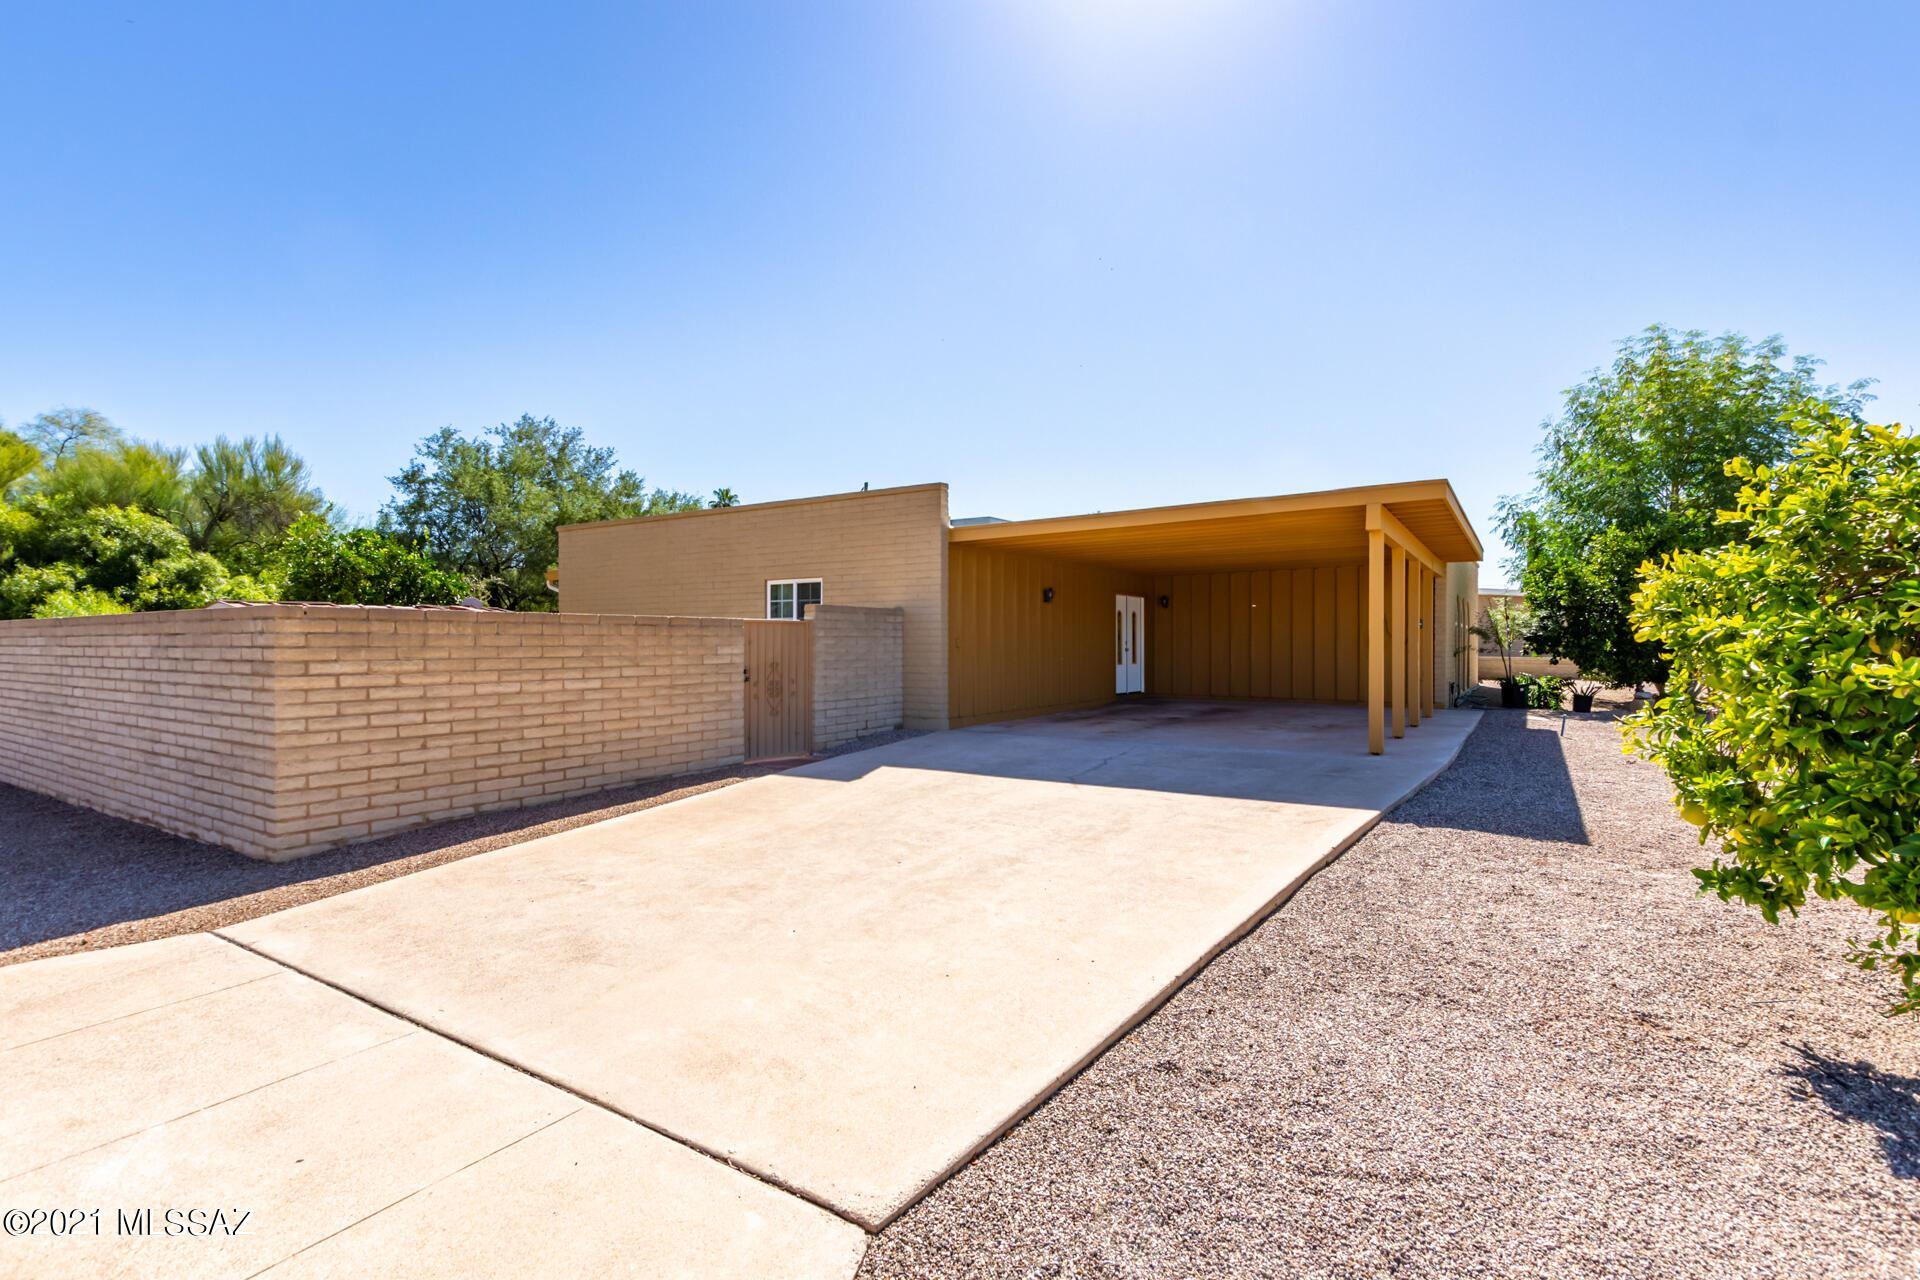 720 N Mann Avenue, Tucson, AZ 85710 - MLS#: 22127518